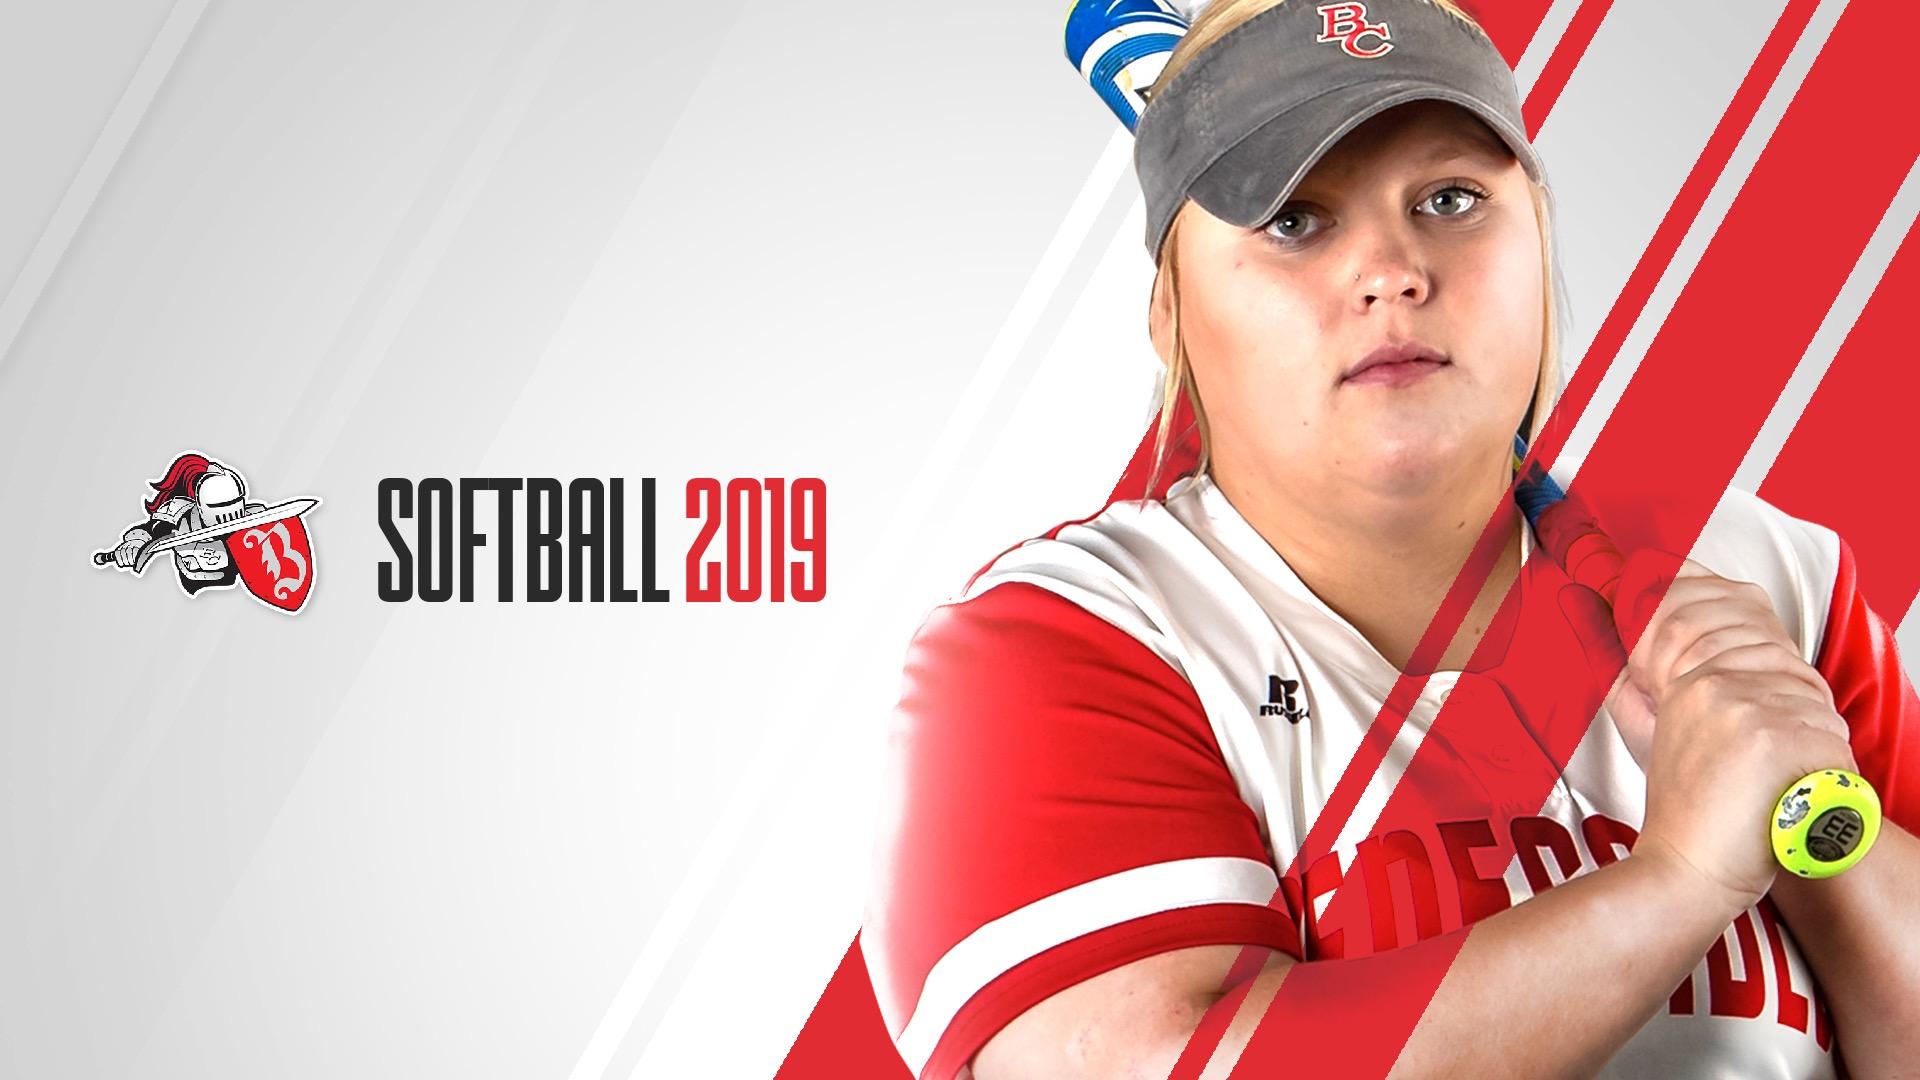 Softball 2019 Promo Photo